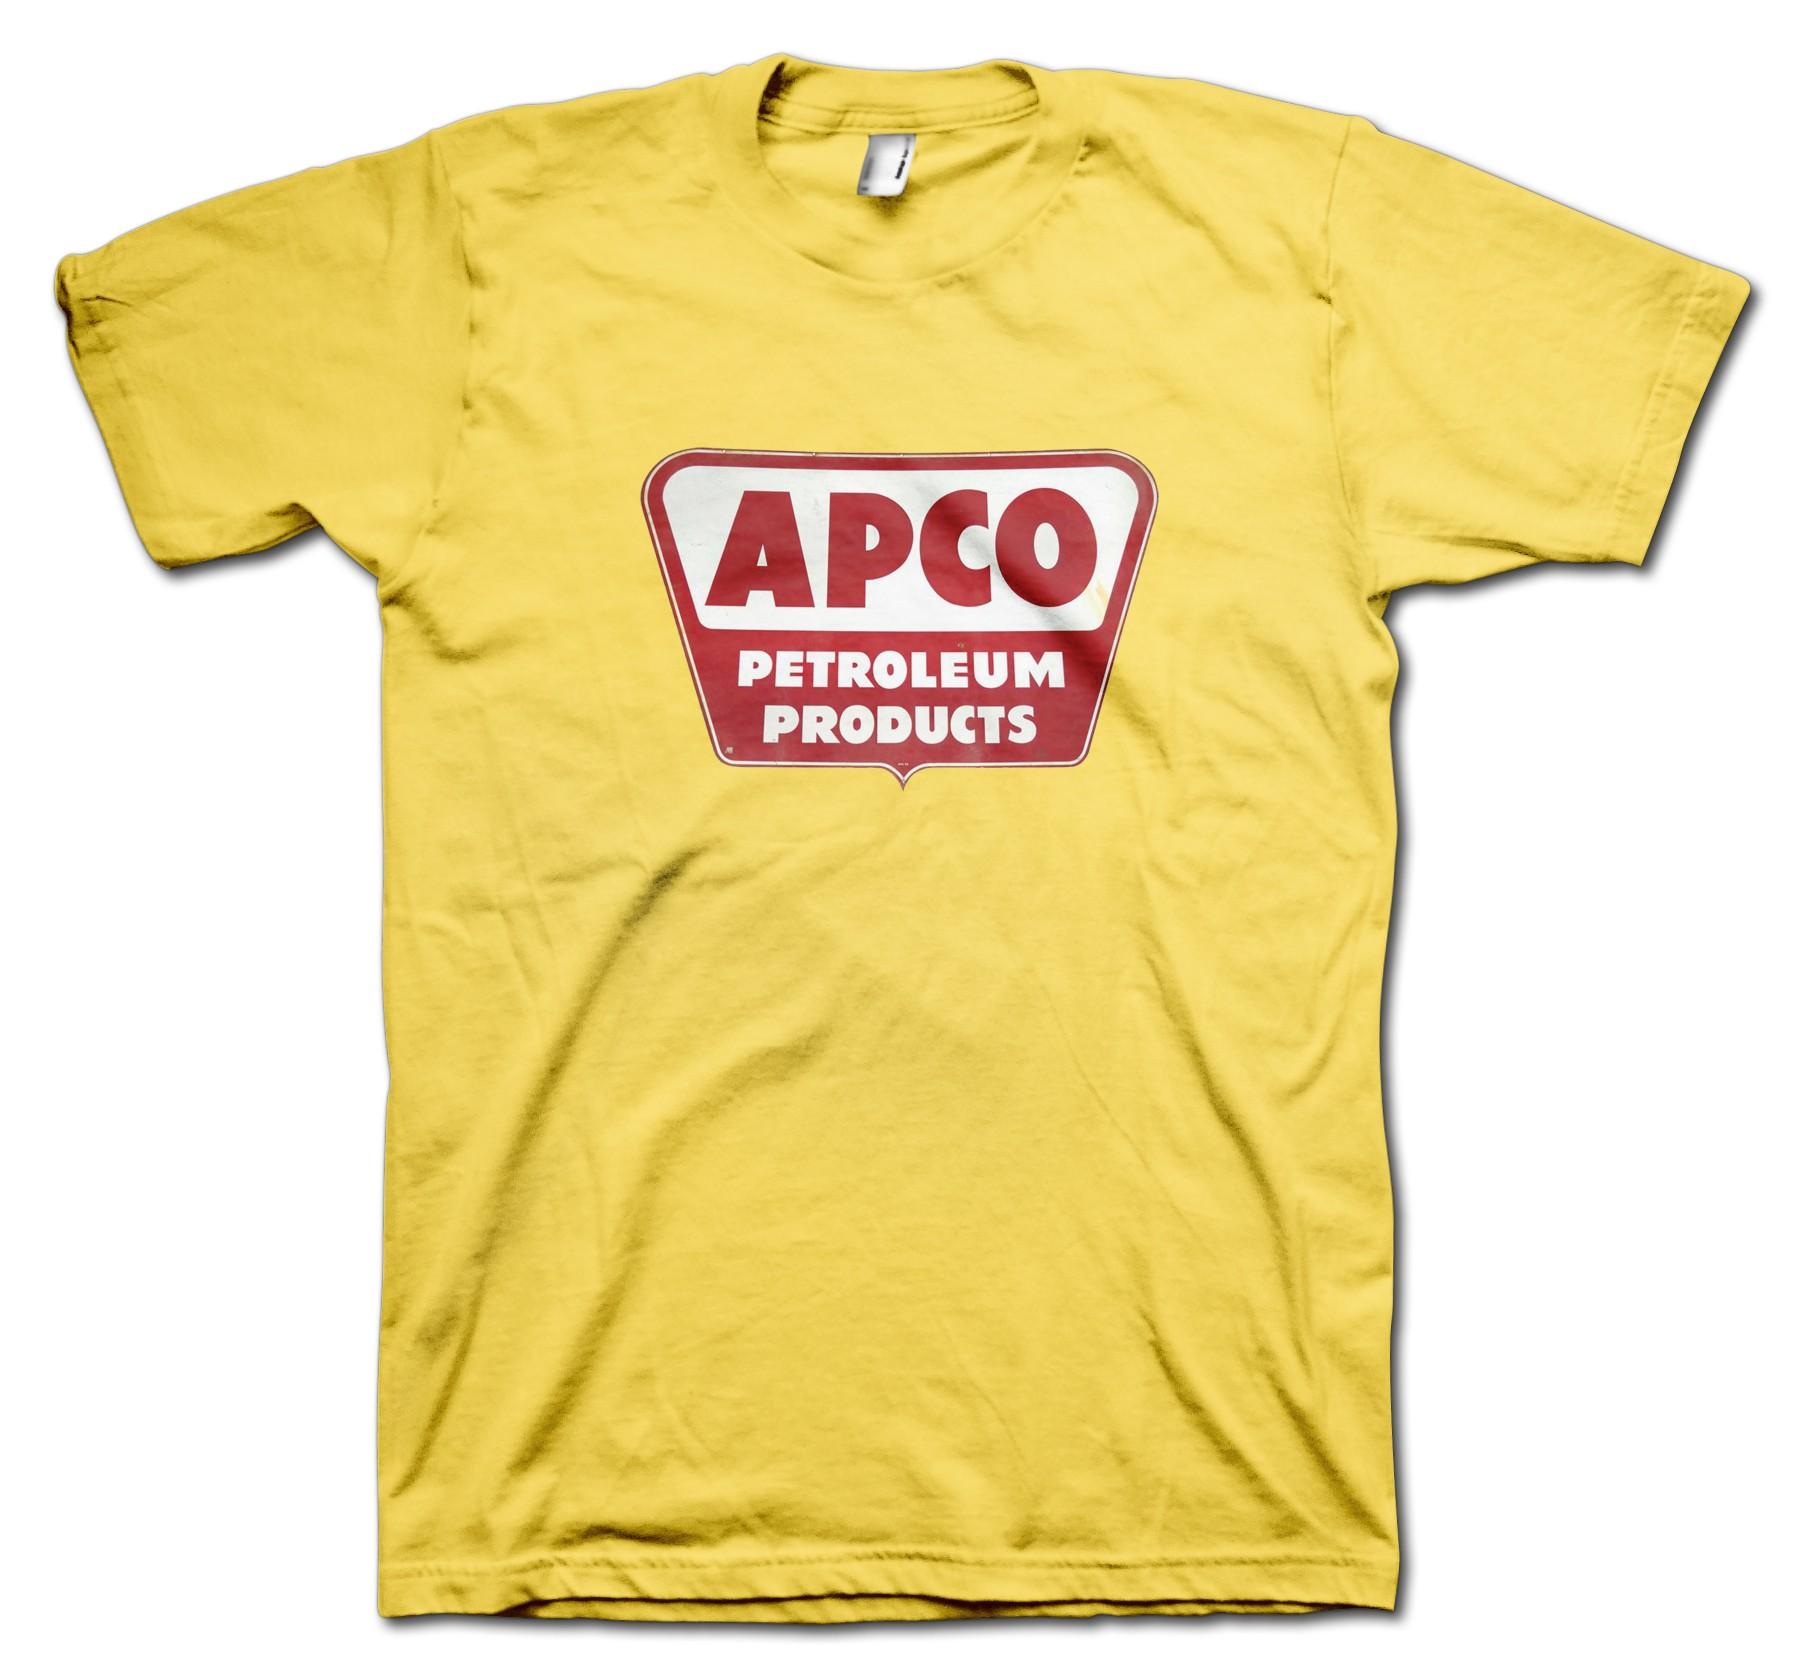 APCO Petroleum T-Shirt